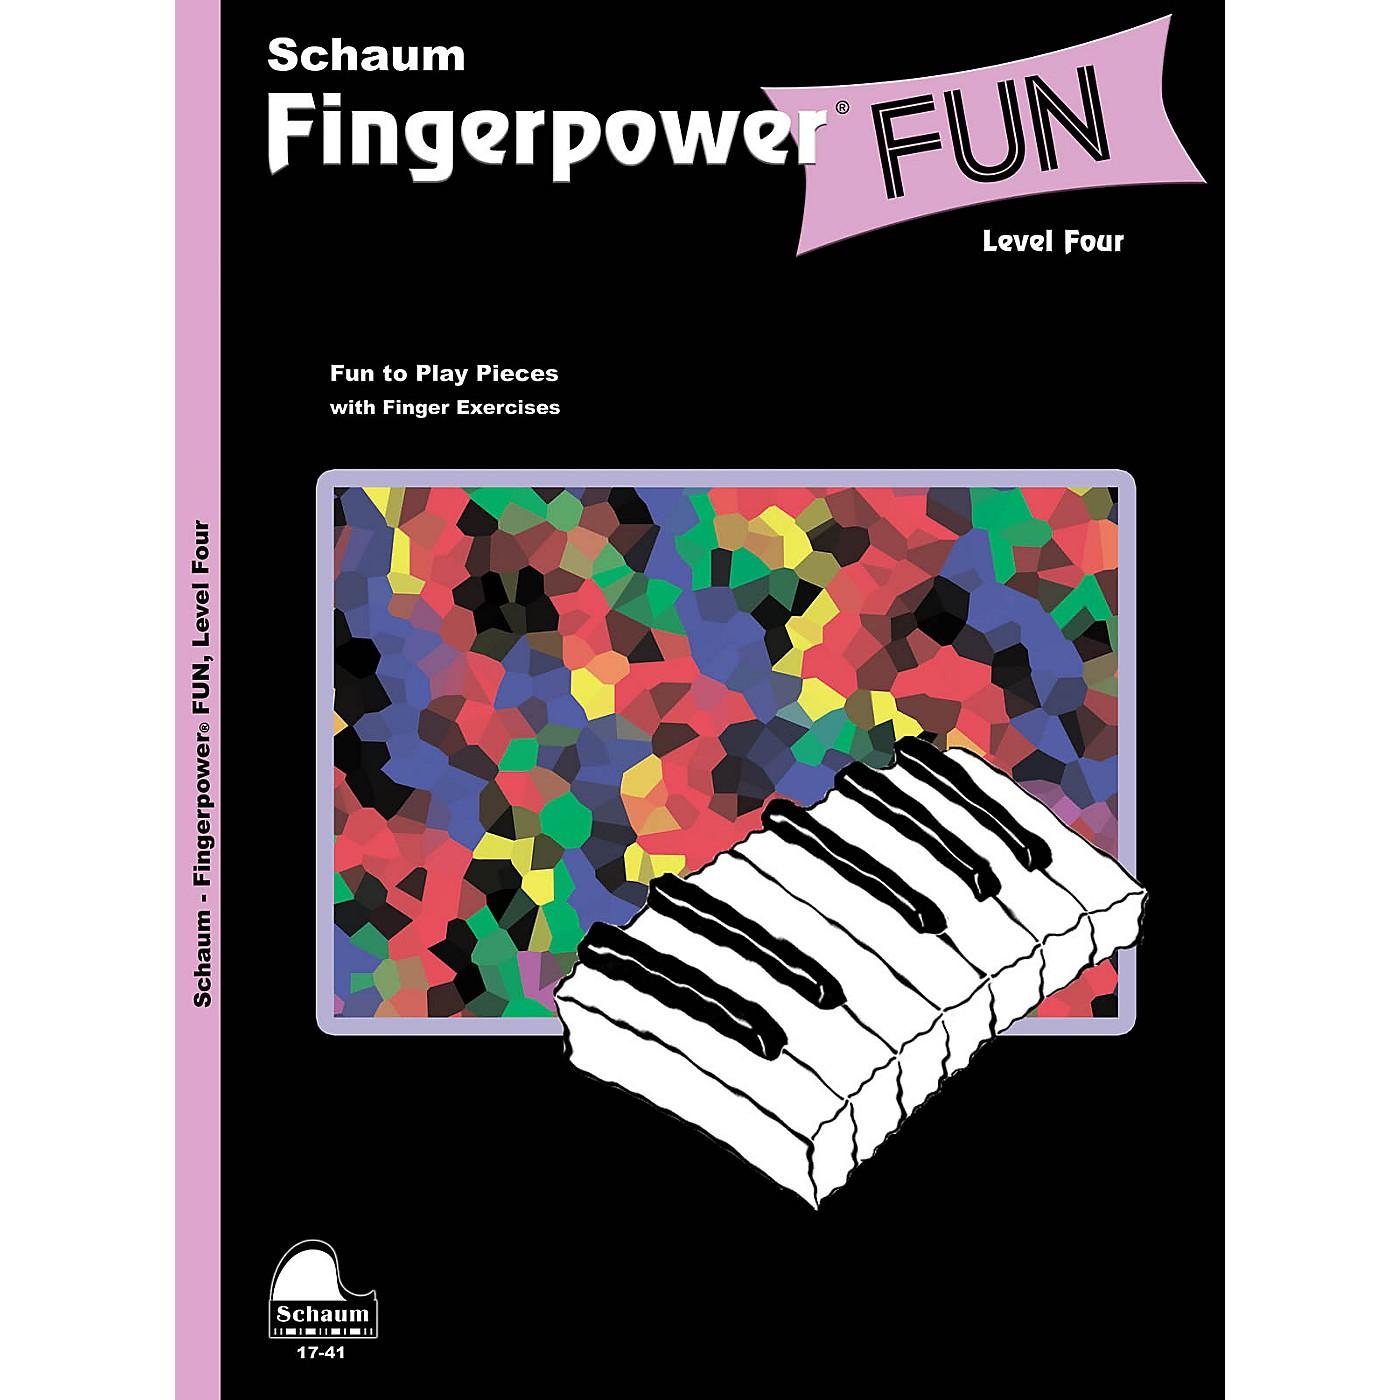 SCHAUM Fingerpower® Fun (Level 4 Inter Level) Educational Piano Book thumbnail